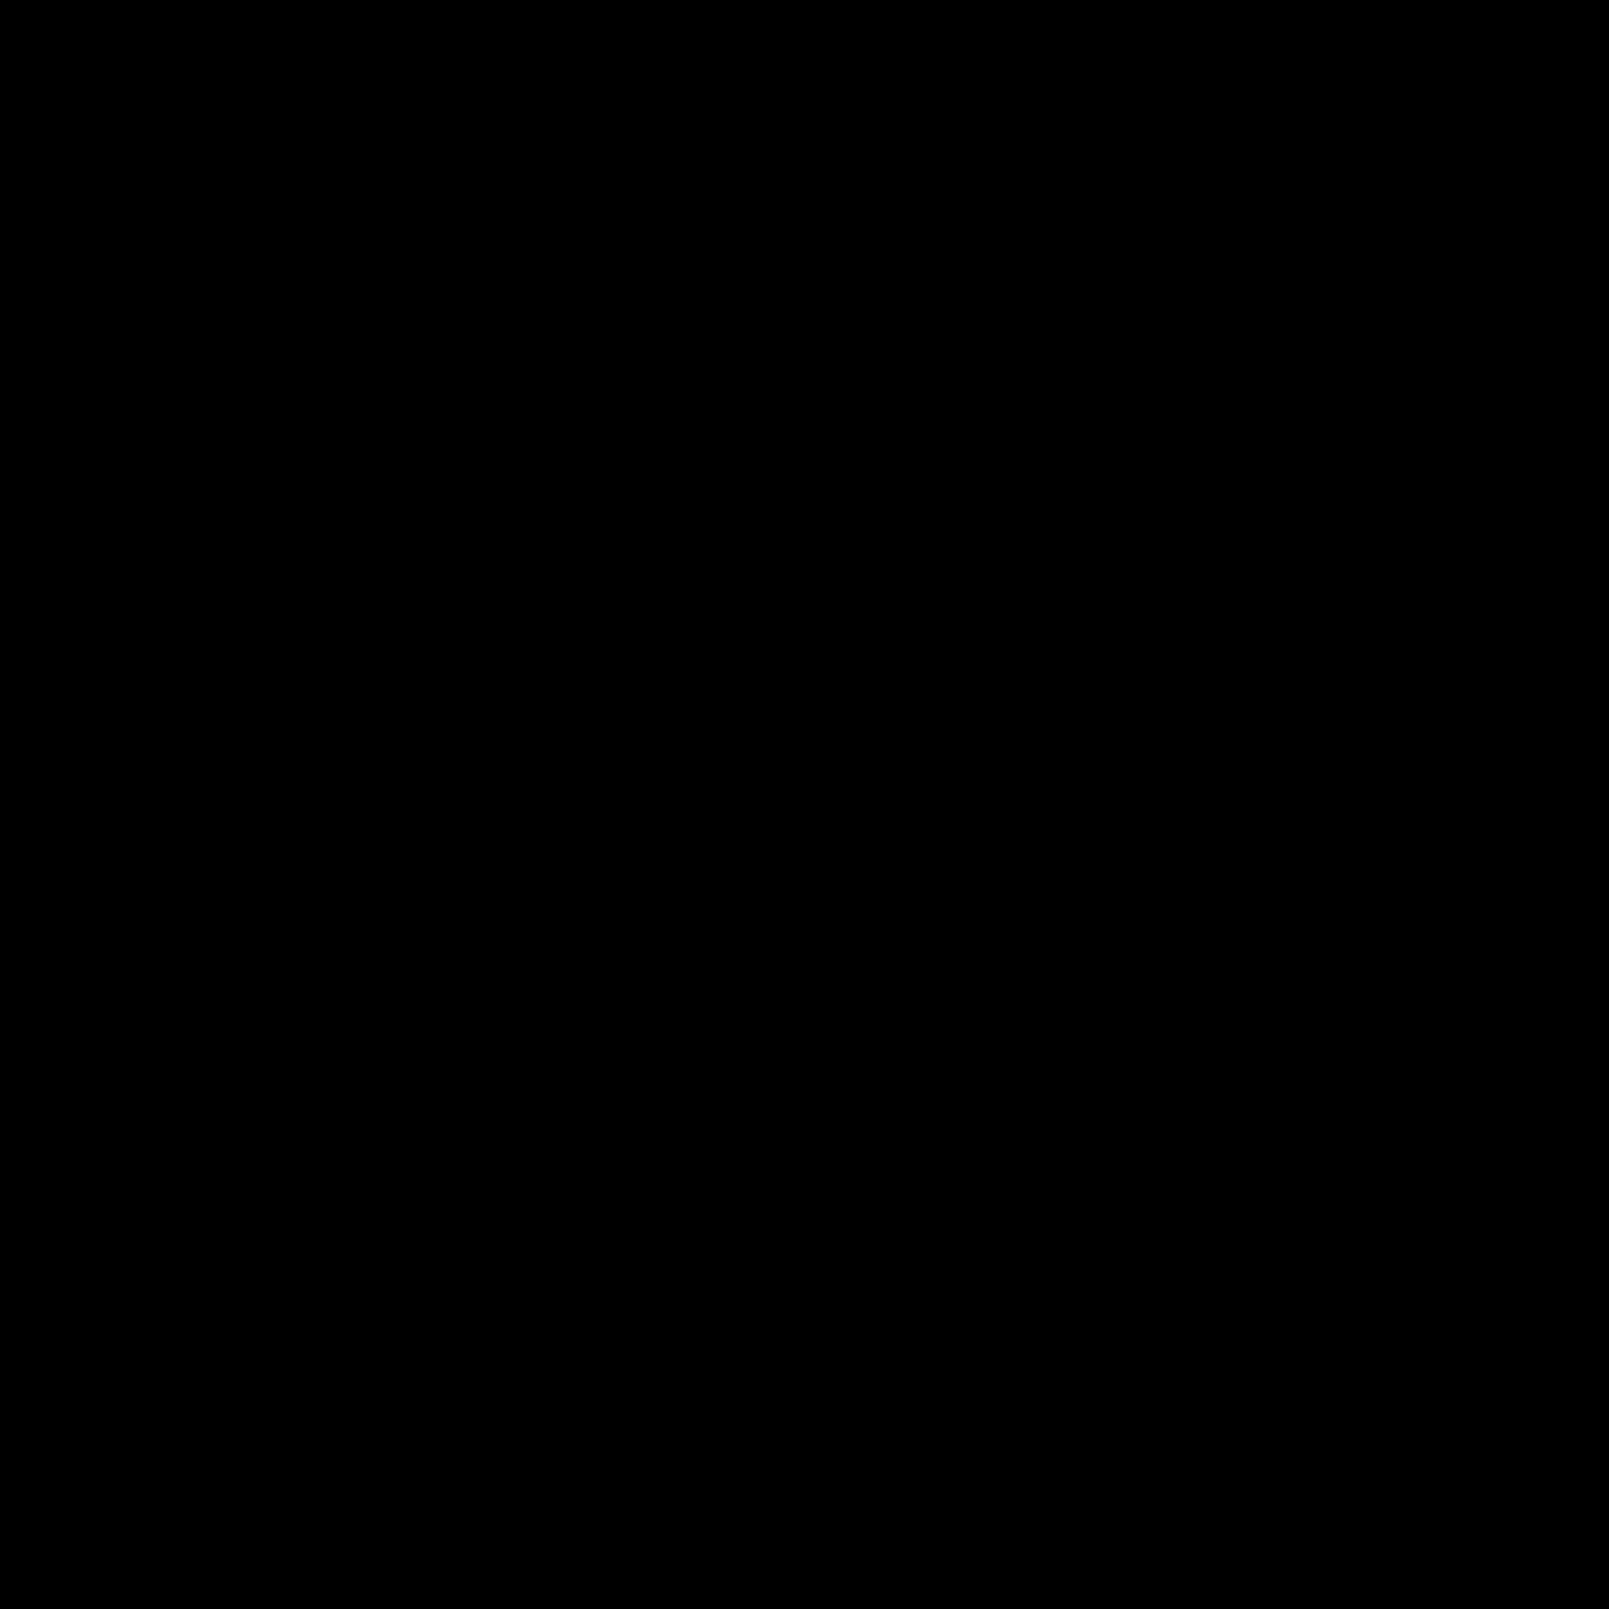 3Claveles kokkahnífur 13cm